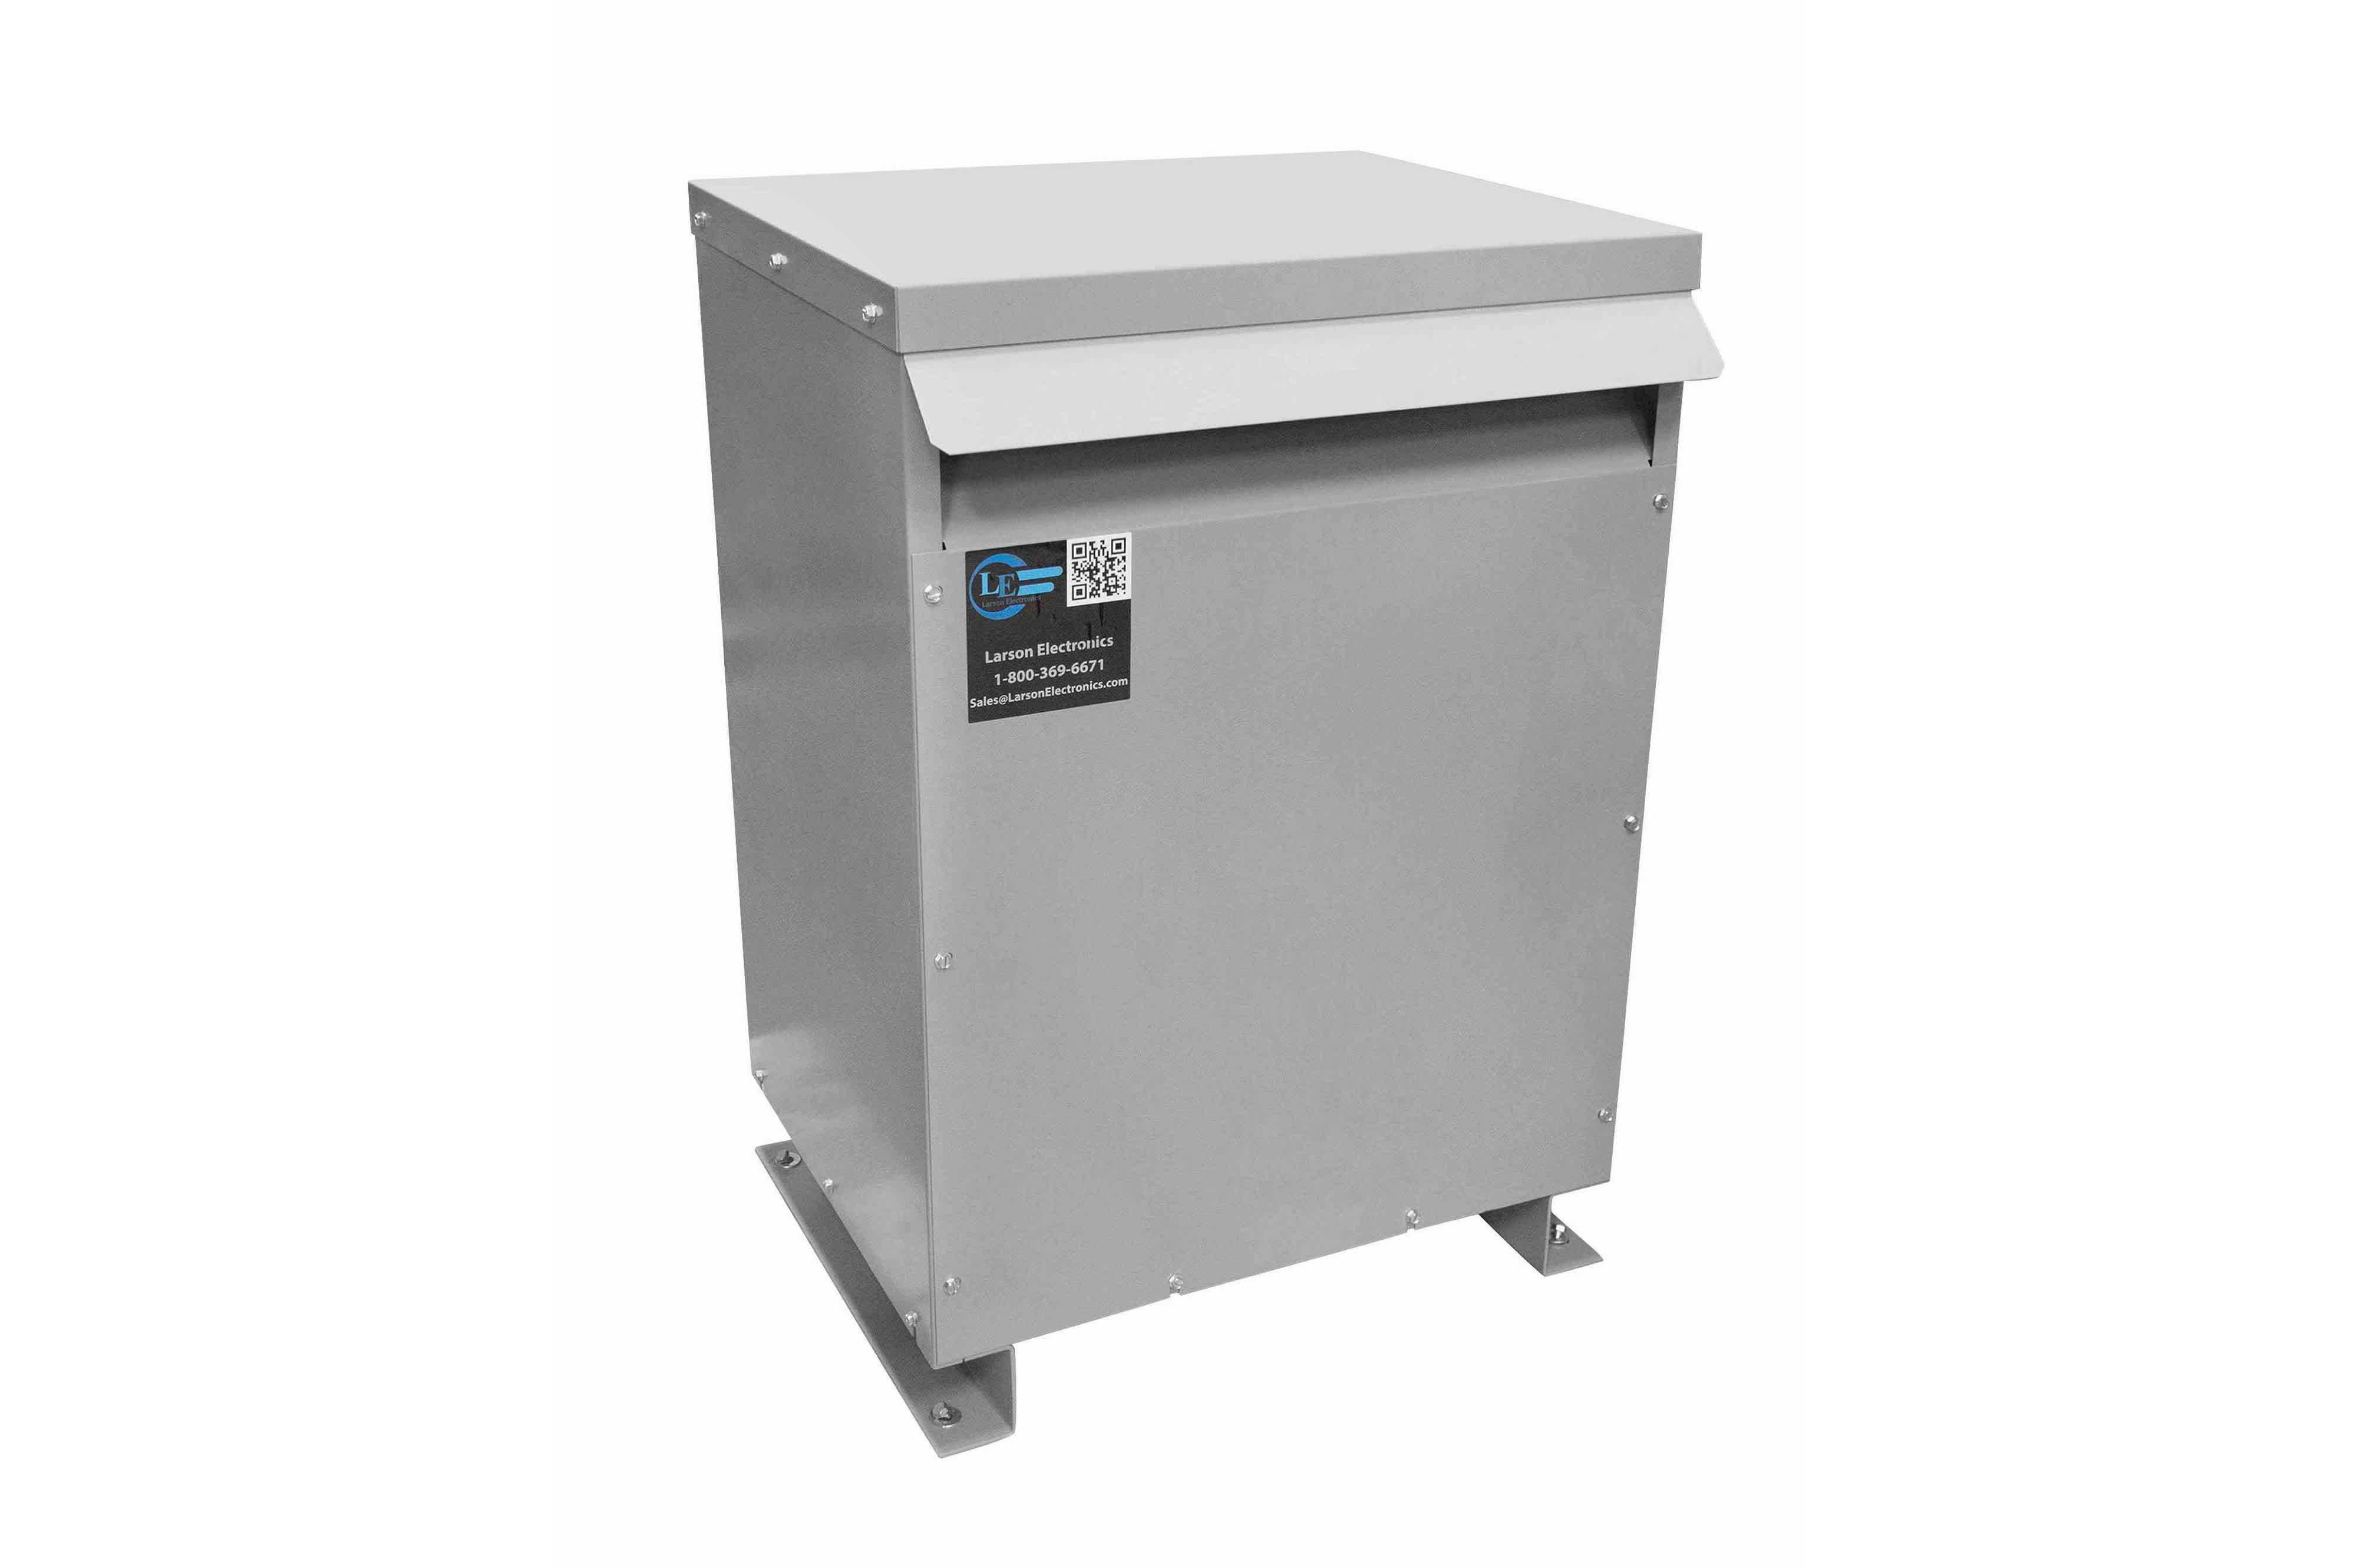 750 kVA 3PH DOE Transformer, 240V Delta Primary, 380Y/220 Wye-N Secondary, N3R, Ventilated, 60 Hz